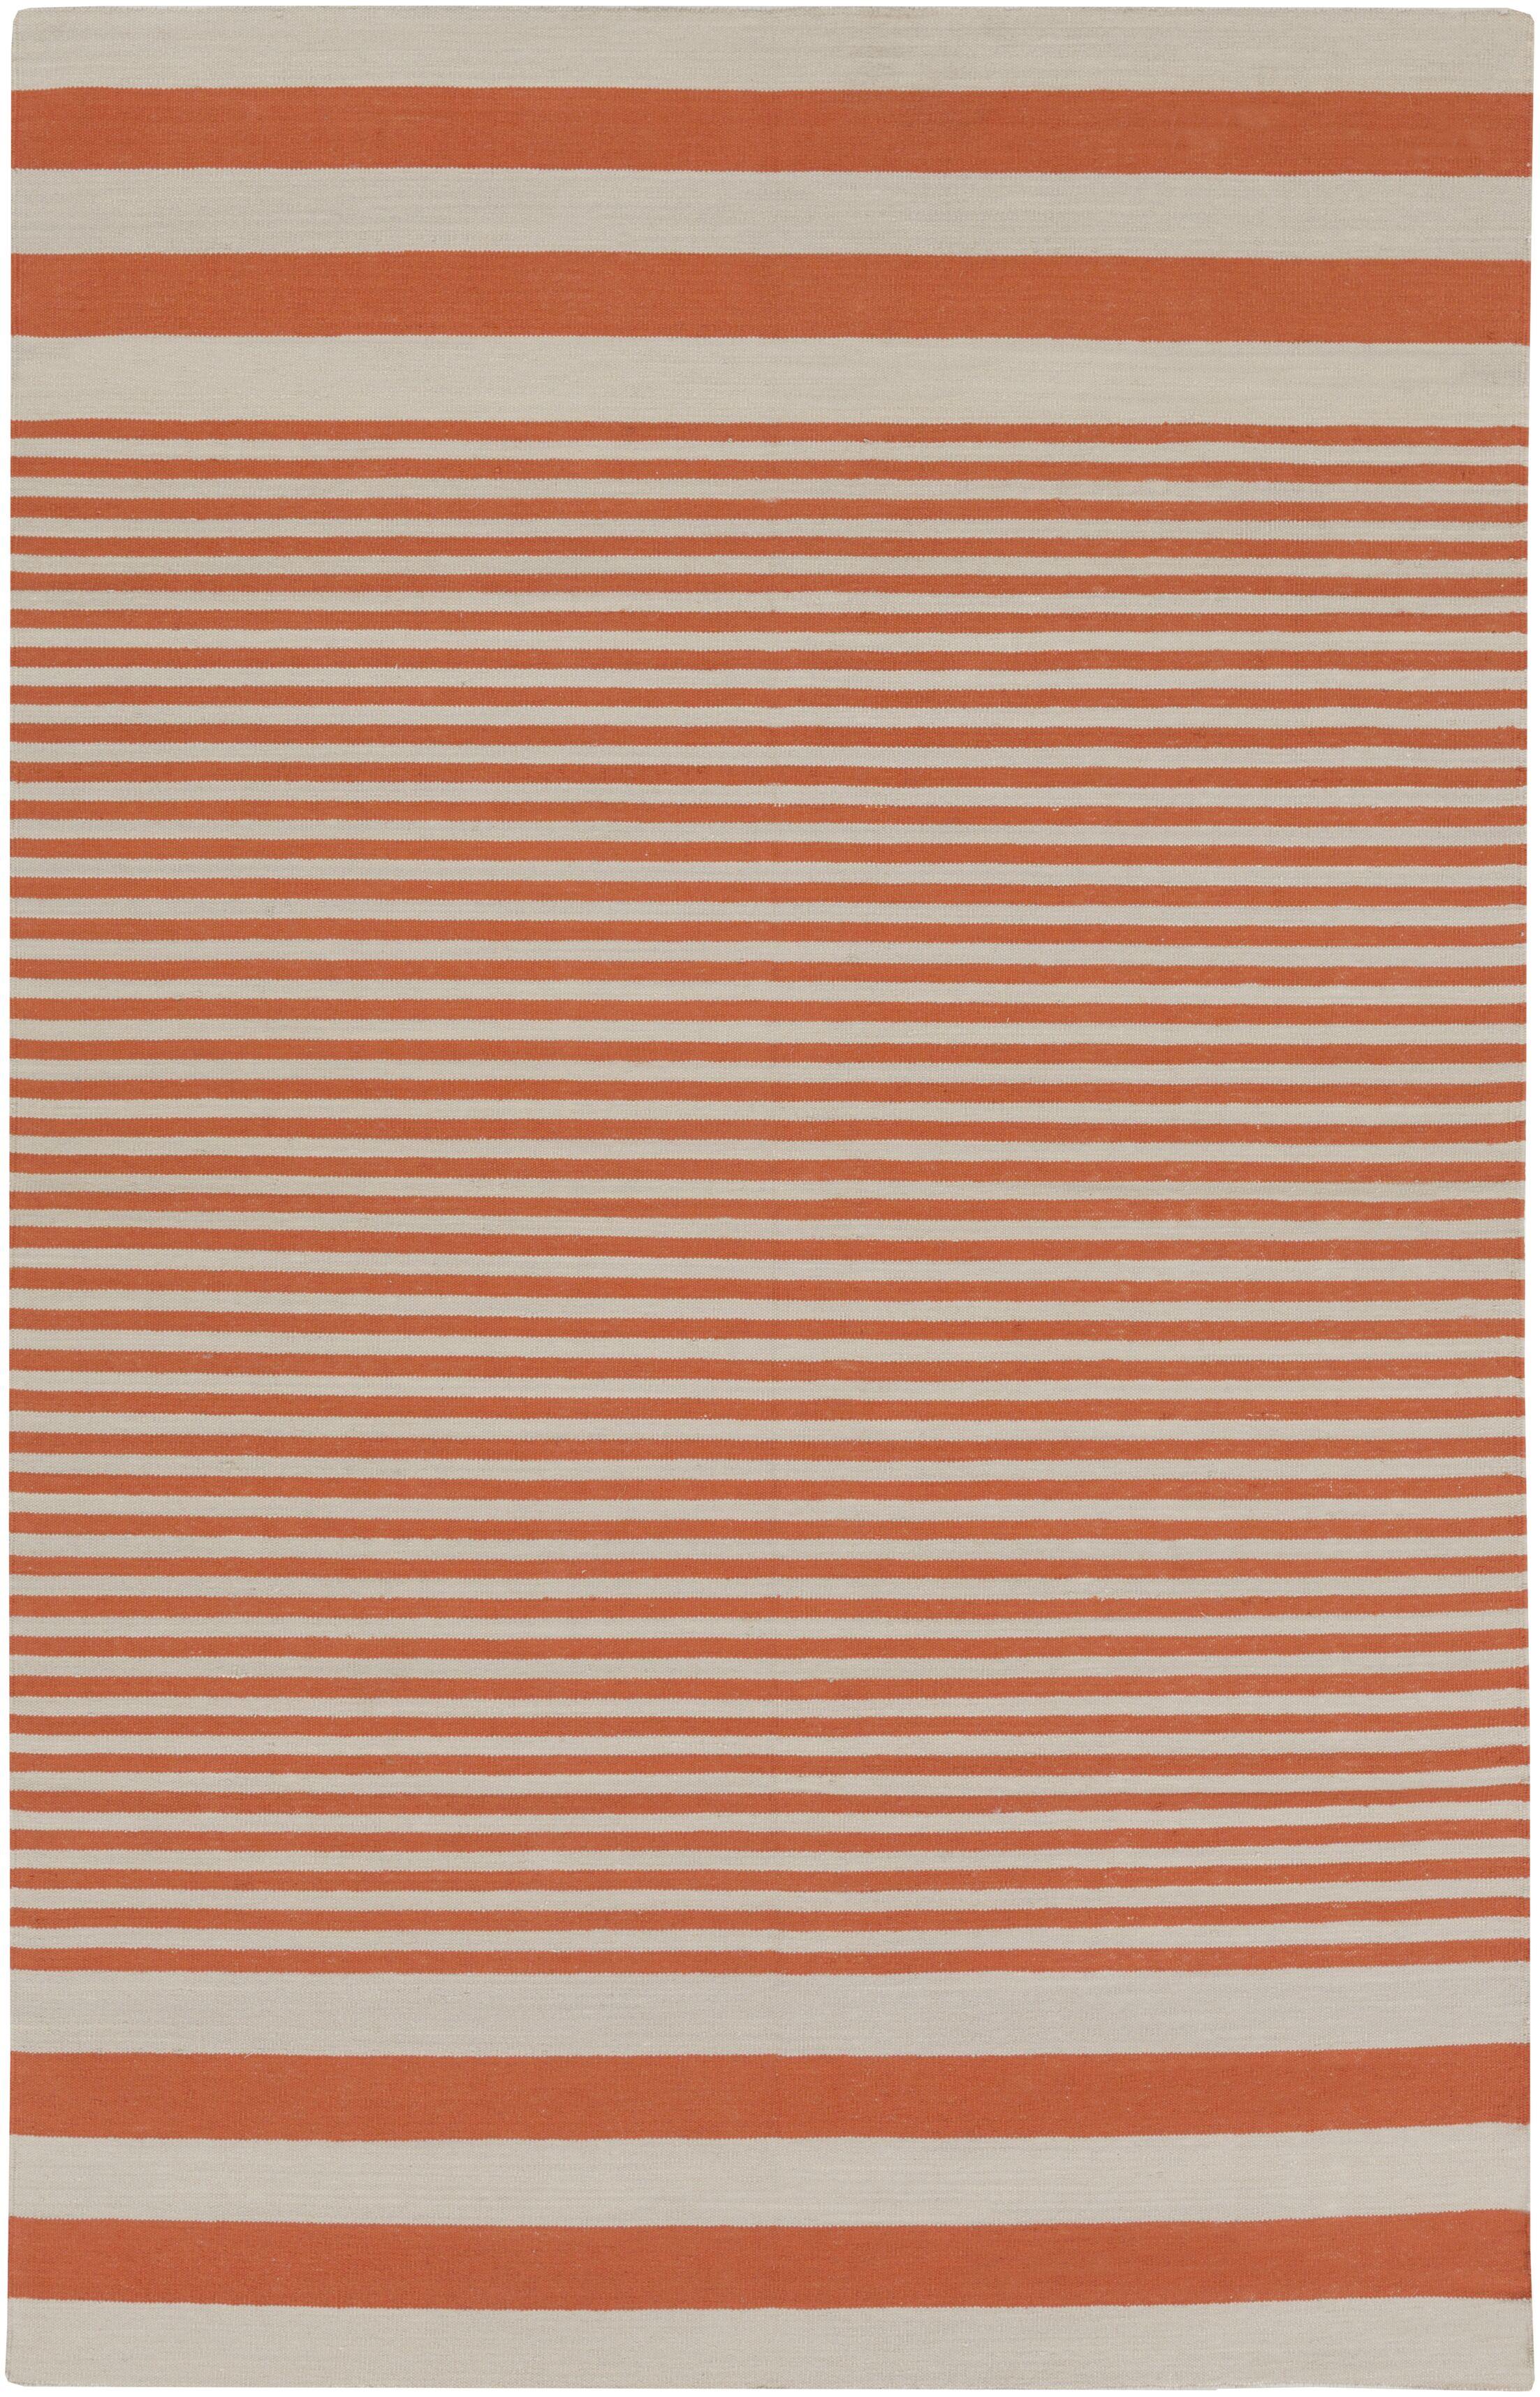 Kinslee Rust Stripe Area Rug Rug Size: Rectangle 5' x 8'